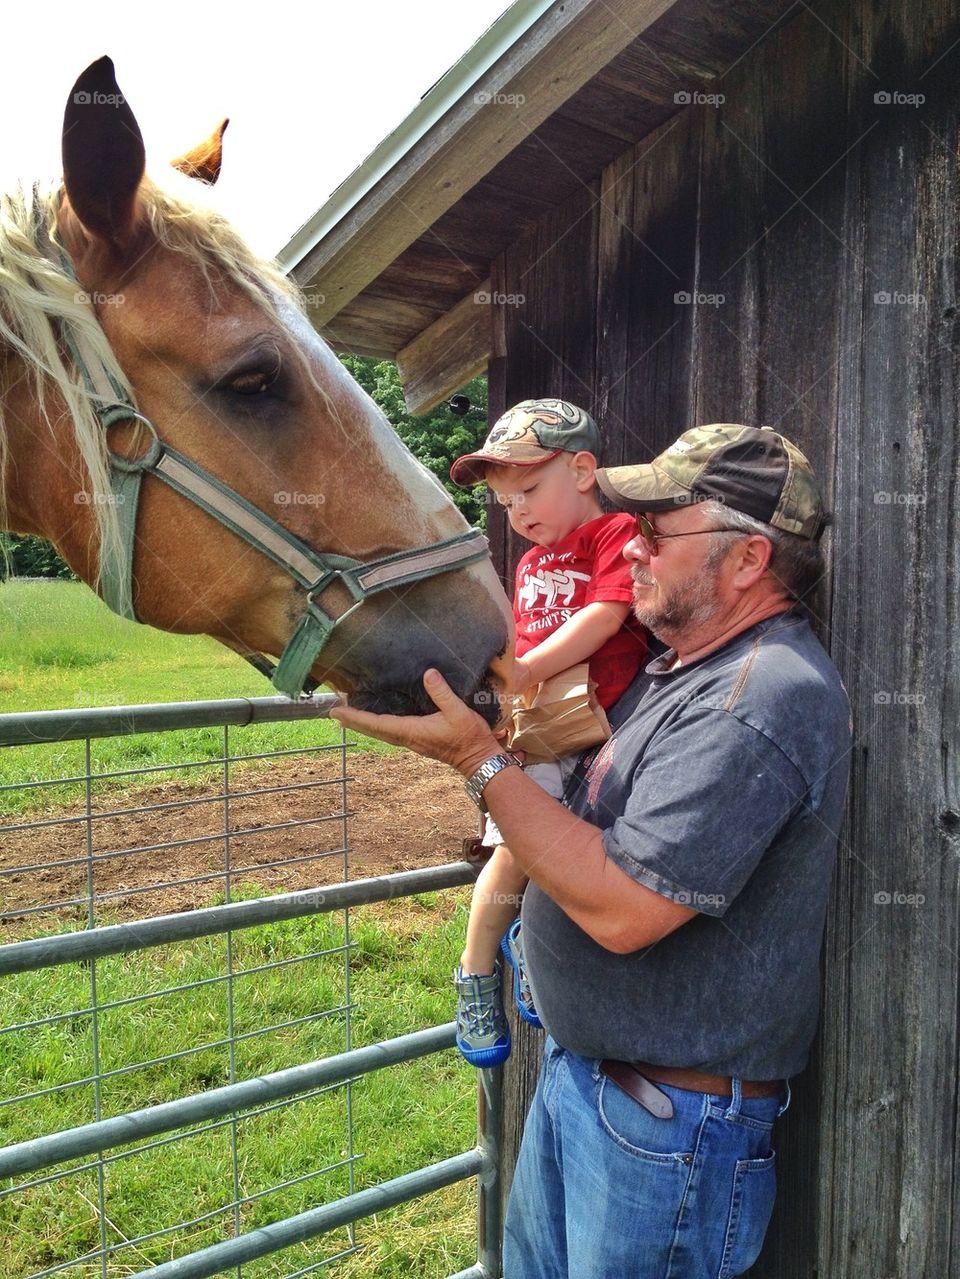 Feeding the horse at the farm